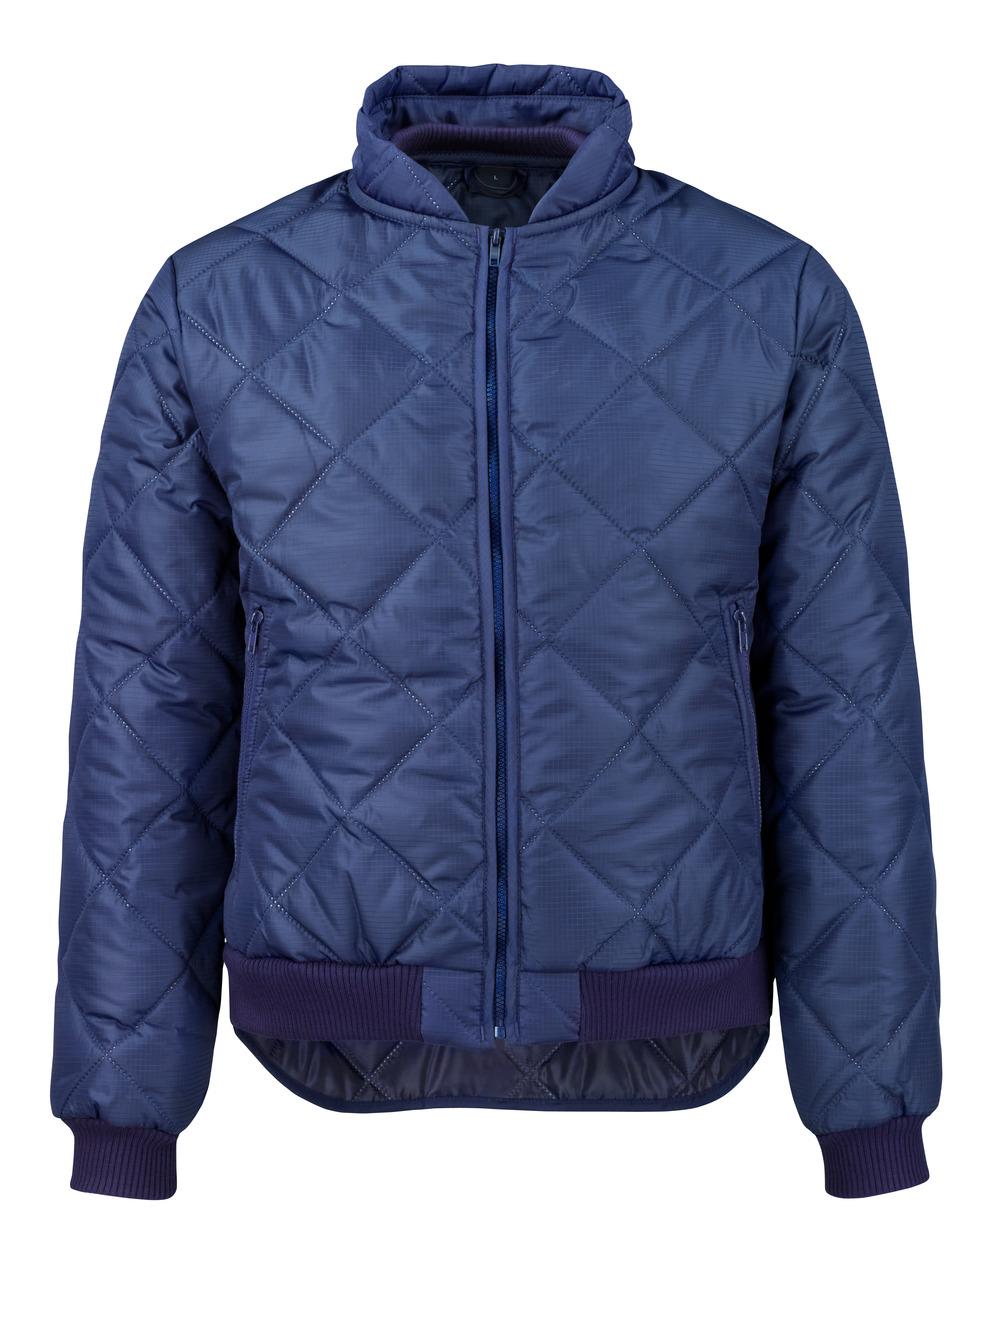 13515-905-01 Thermal Jacket - navy